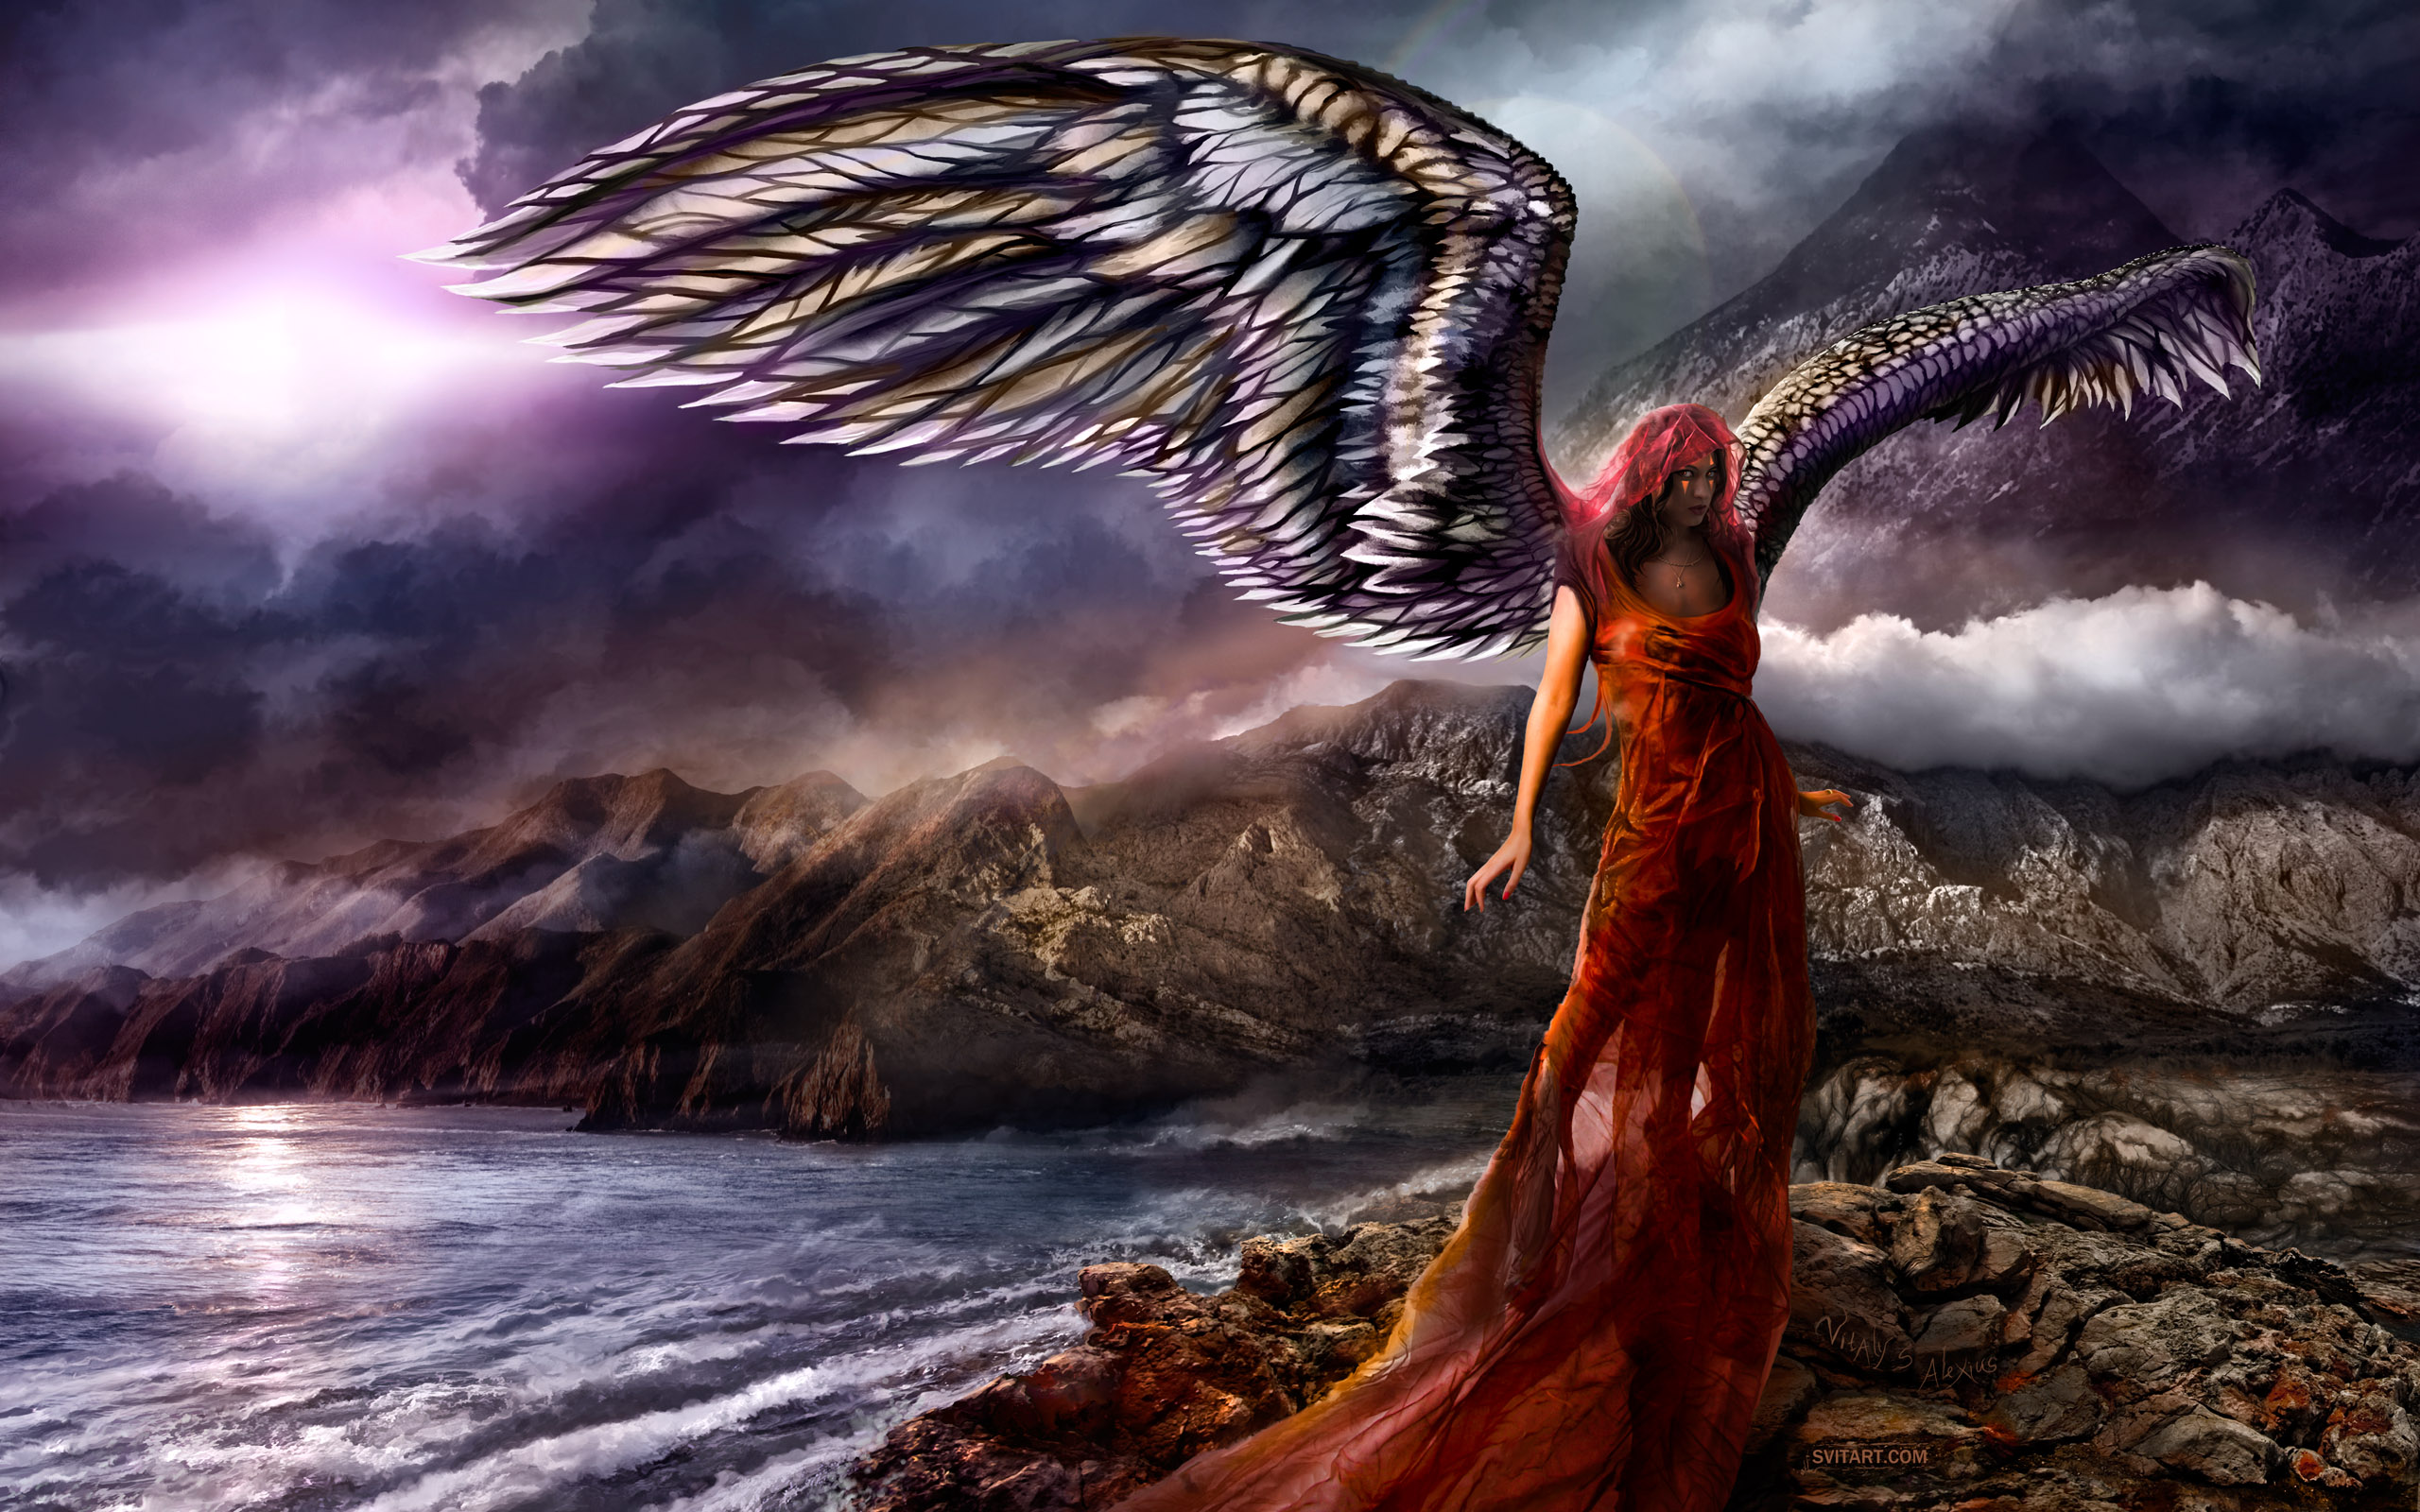 Фэнтези - Ангел  пейзаж Фэнтези Red Hair Обои